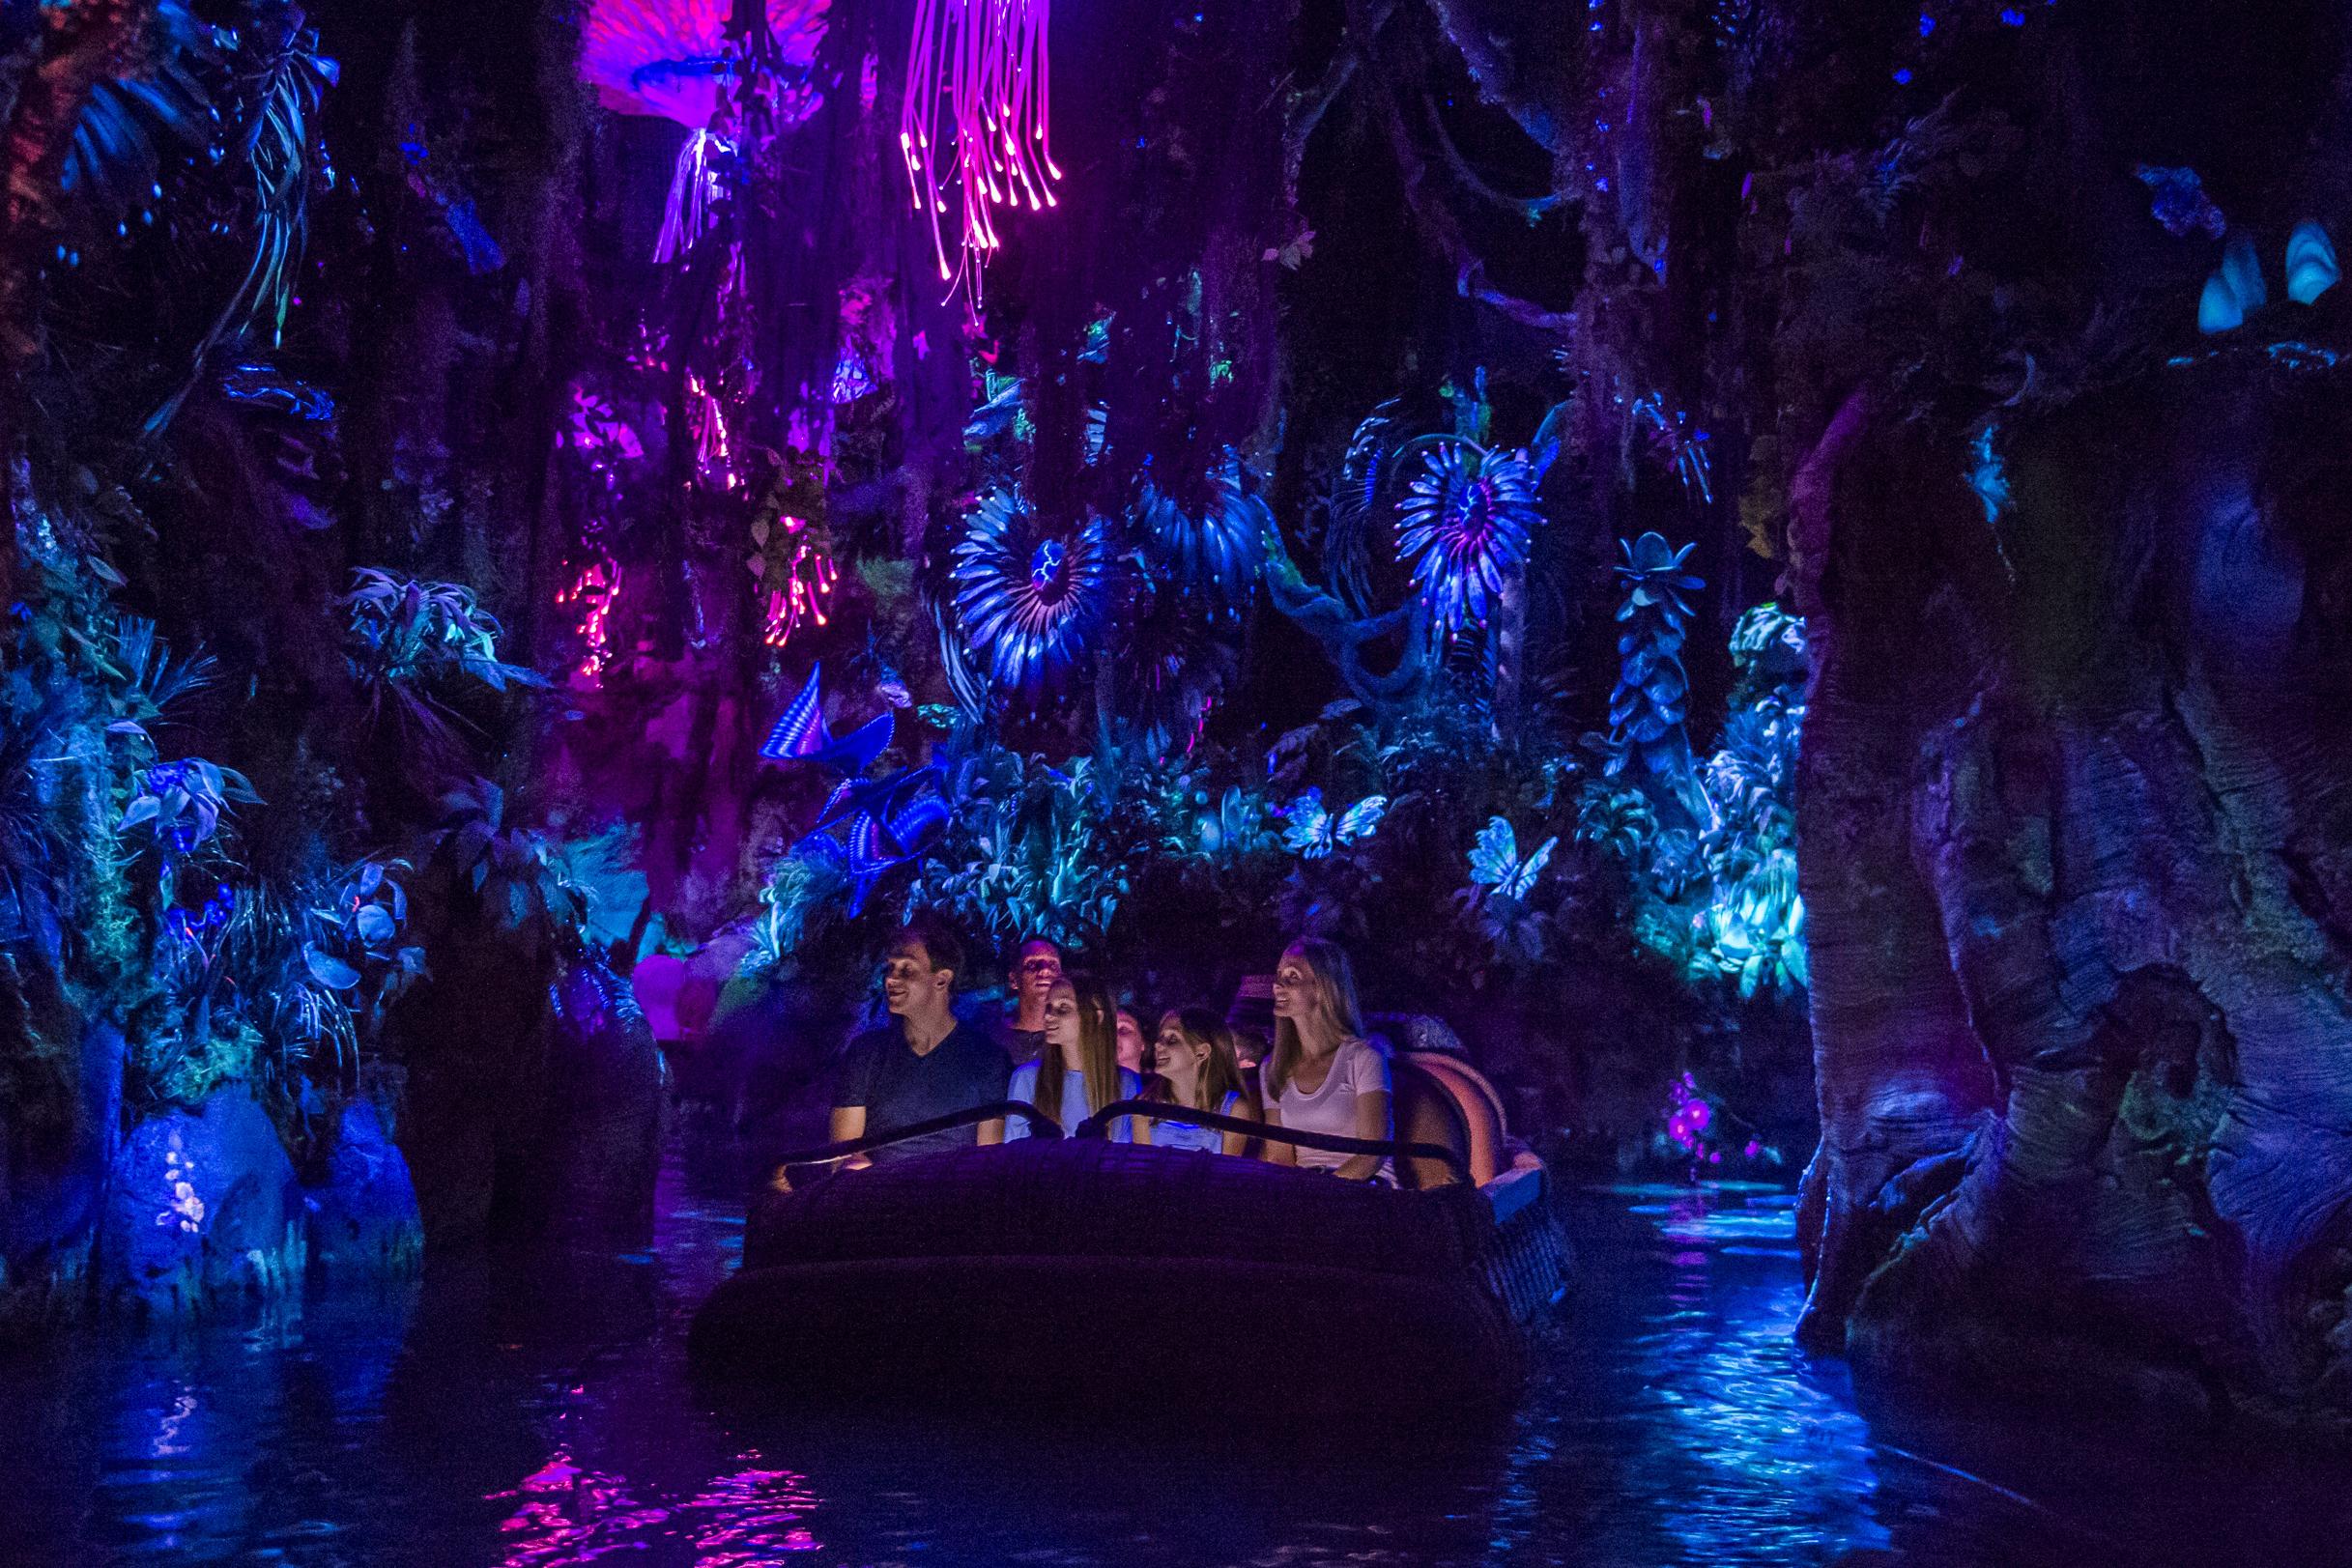 Na'vi River Journey ride